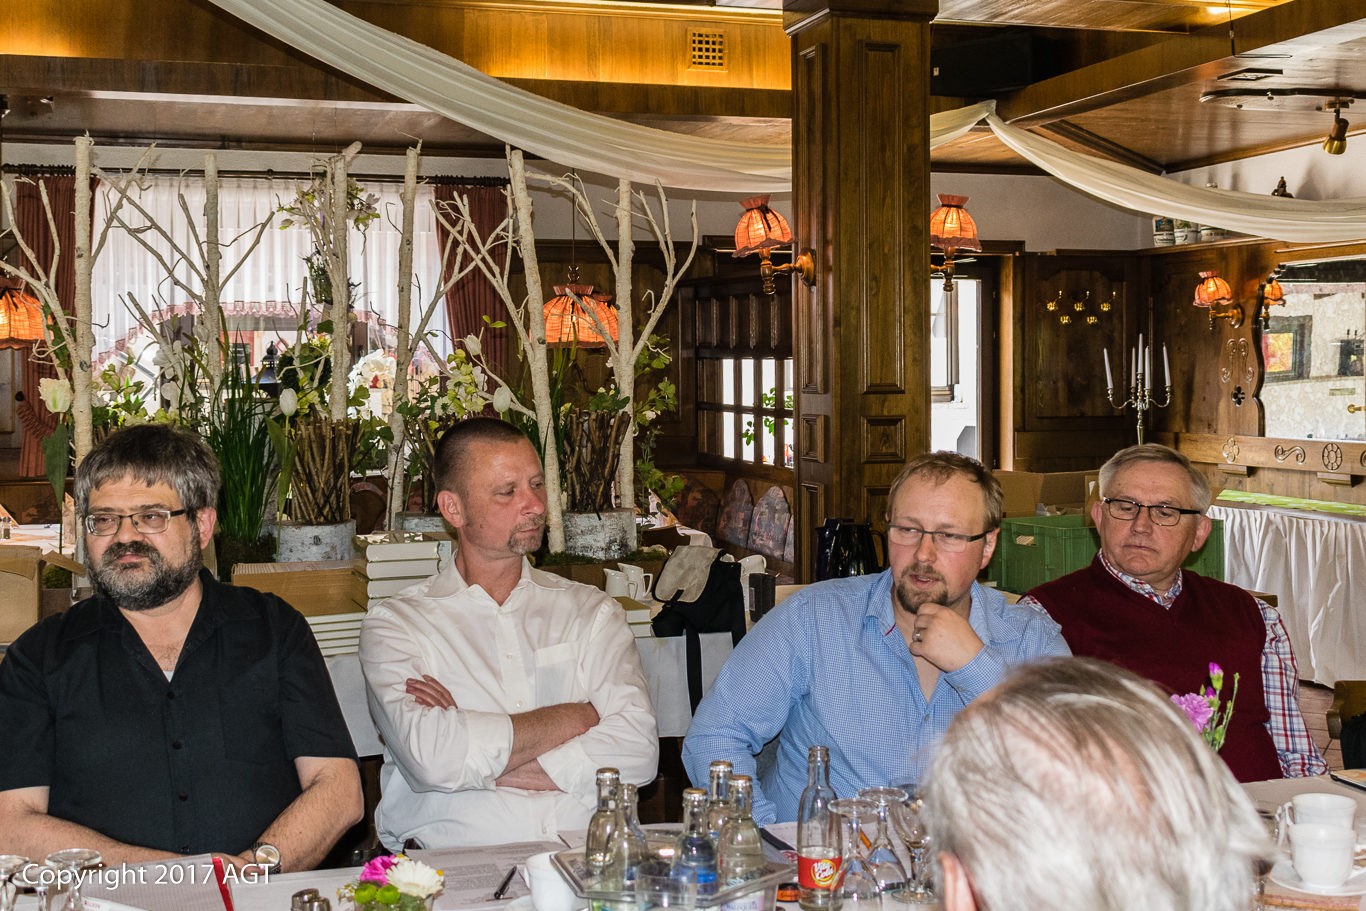 AGT, Christian Kirchner, Heidi Hölscher, JHV, Rainer Mangner, Schmalkalden, Udo Hagner